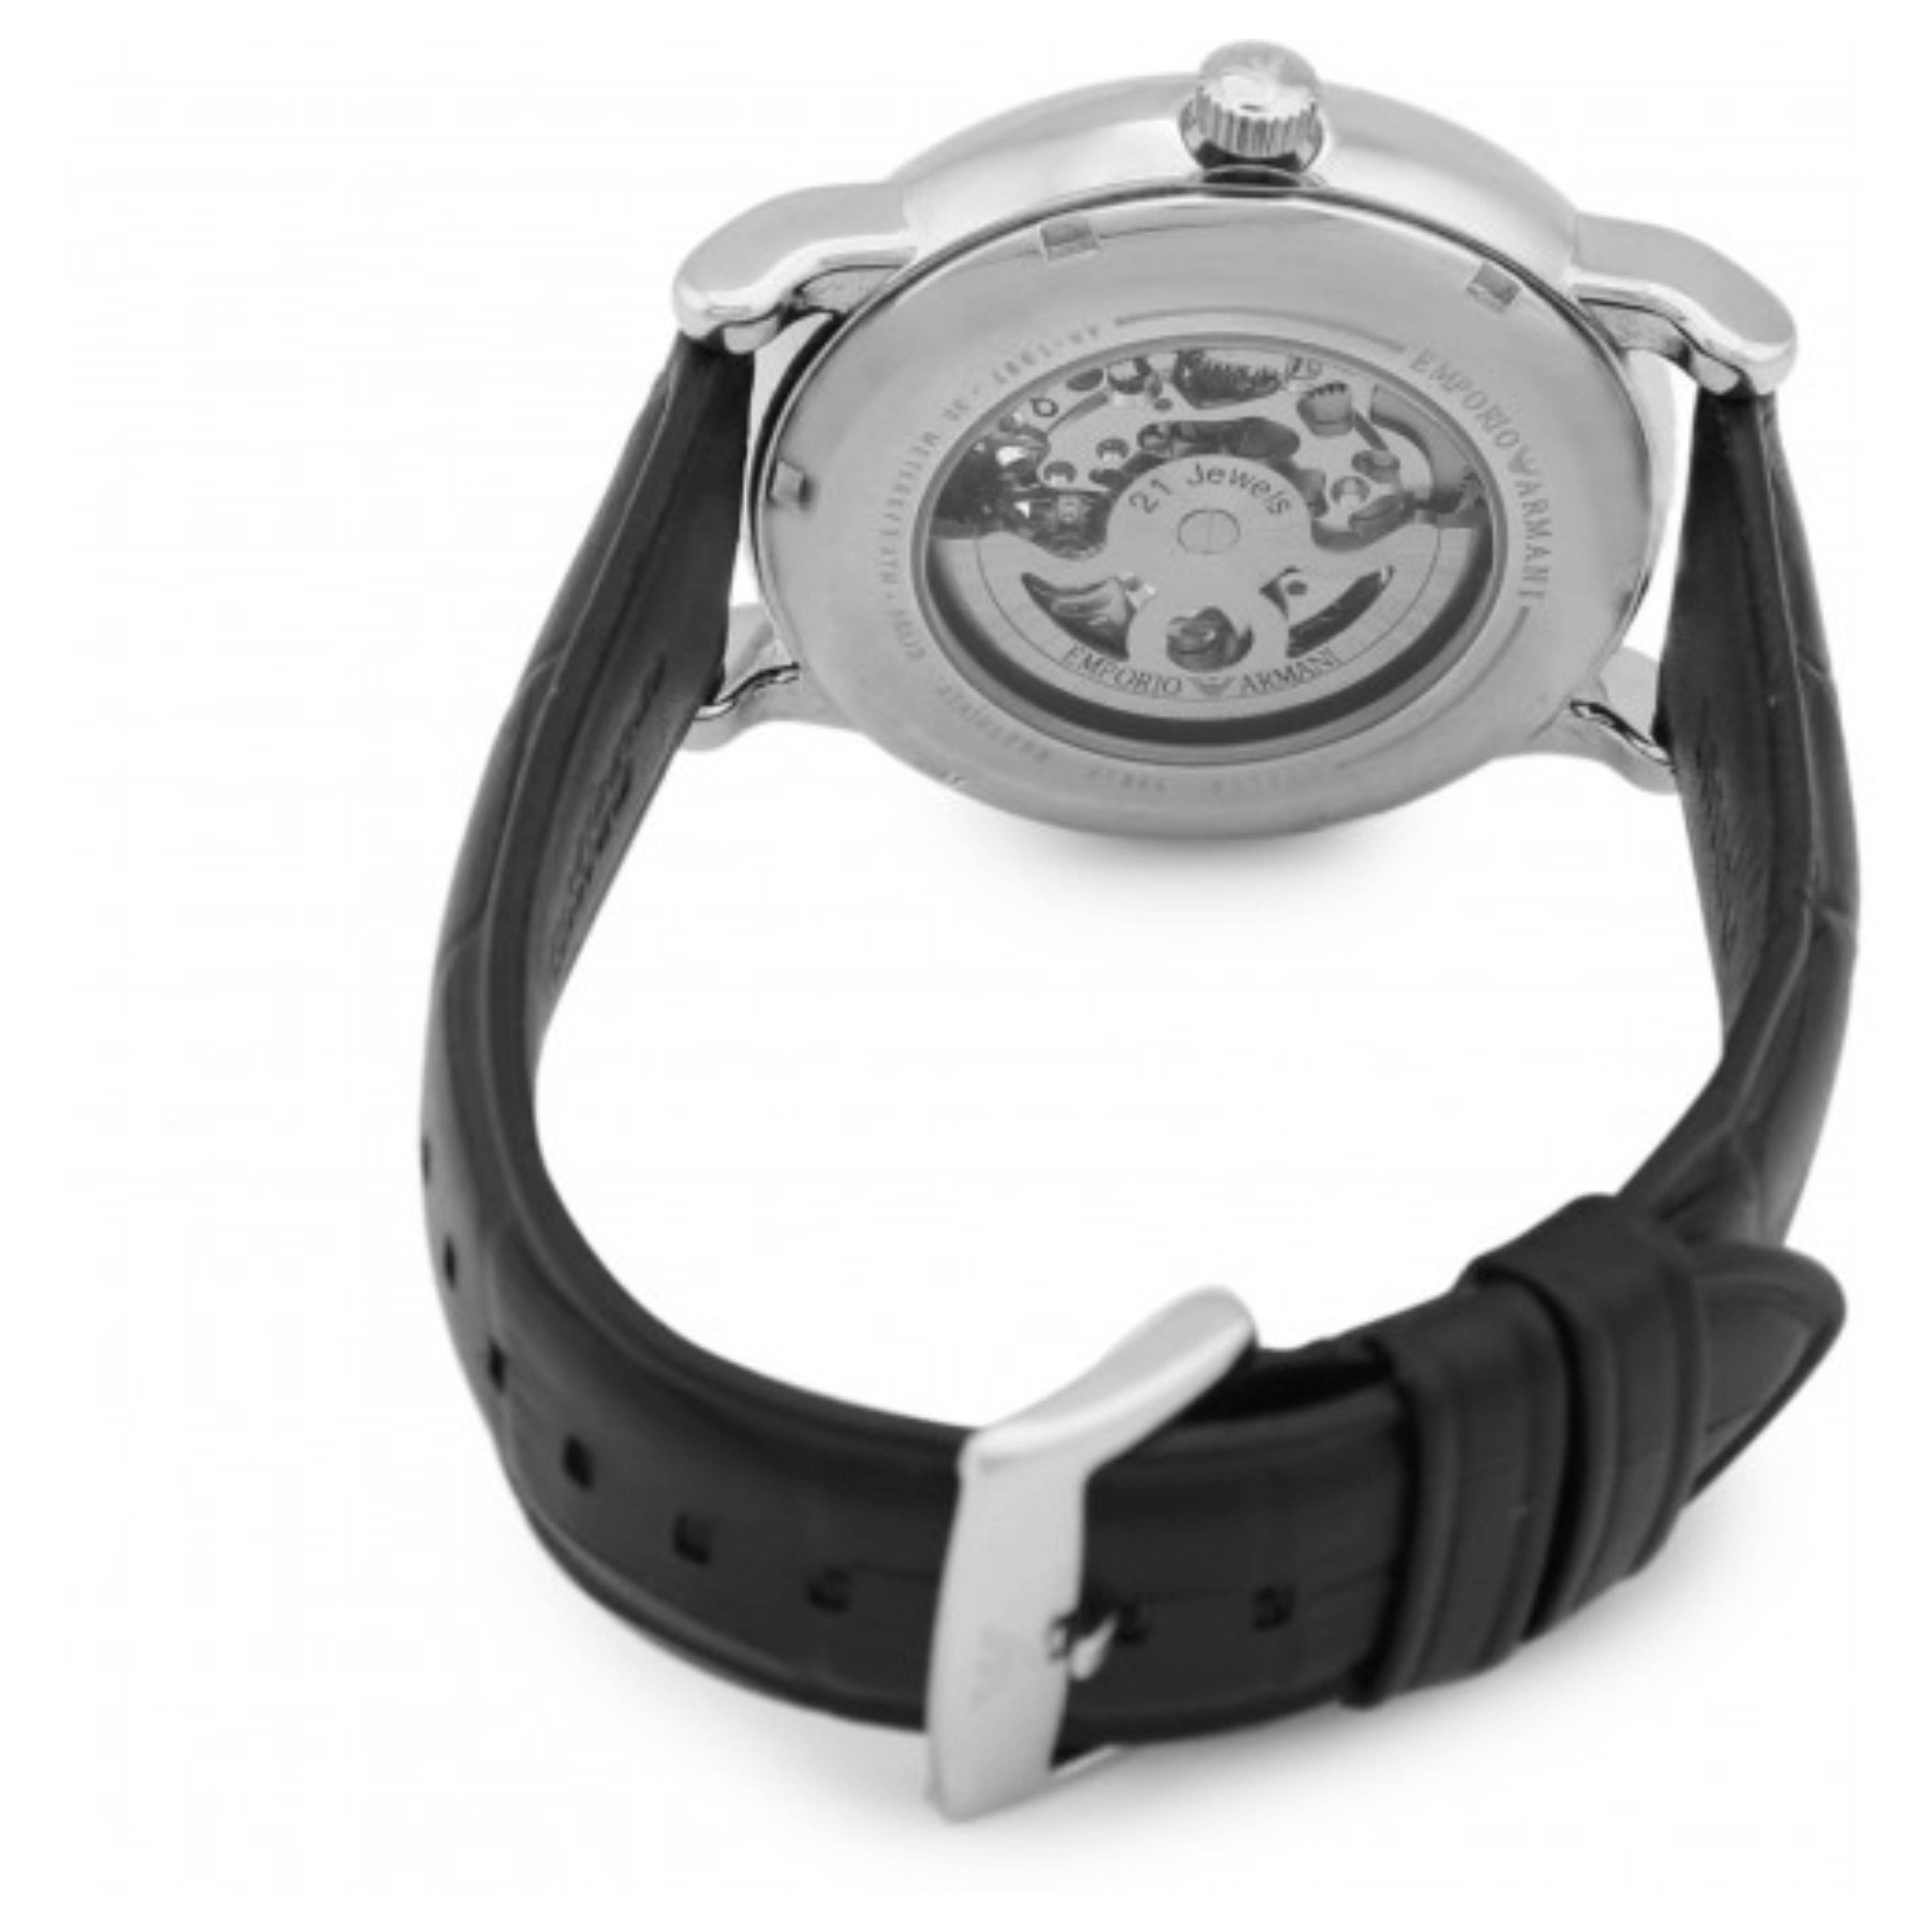 0763be355d5ca Emporio Armani Meccanico Men's Watch AR1997 | Silver Skeleton Dial | Black  Leather Strap Thumbnail 2